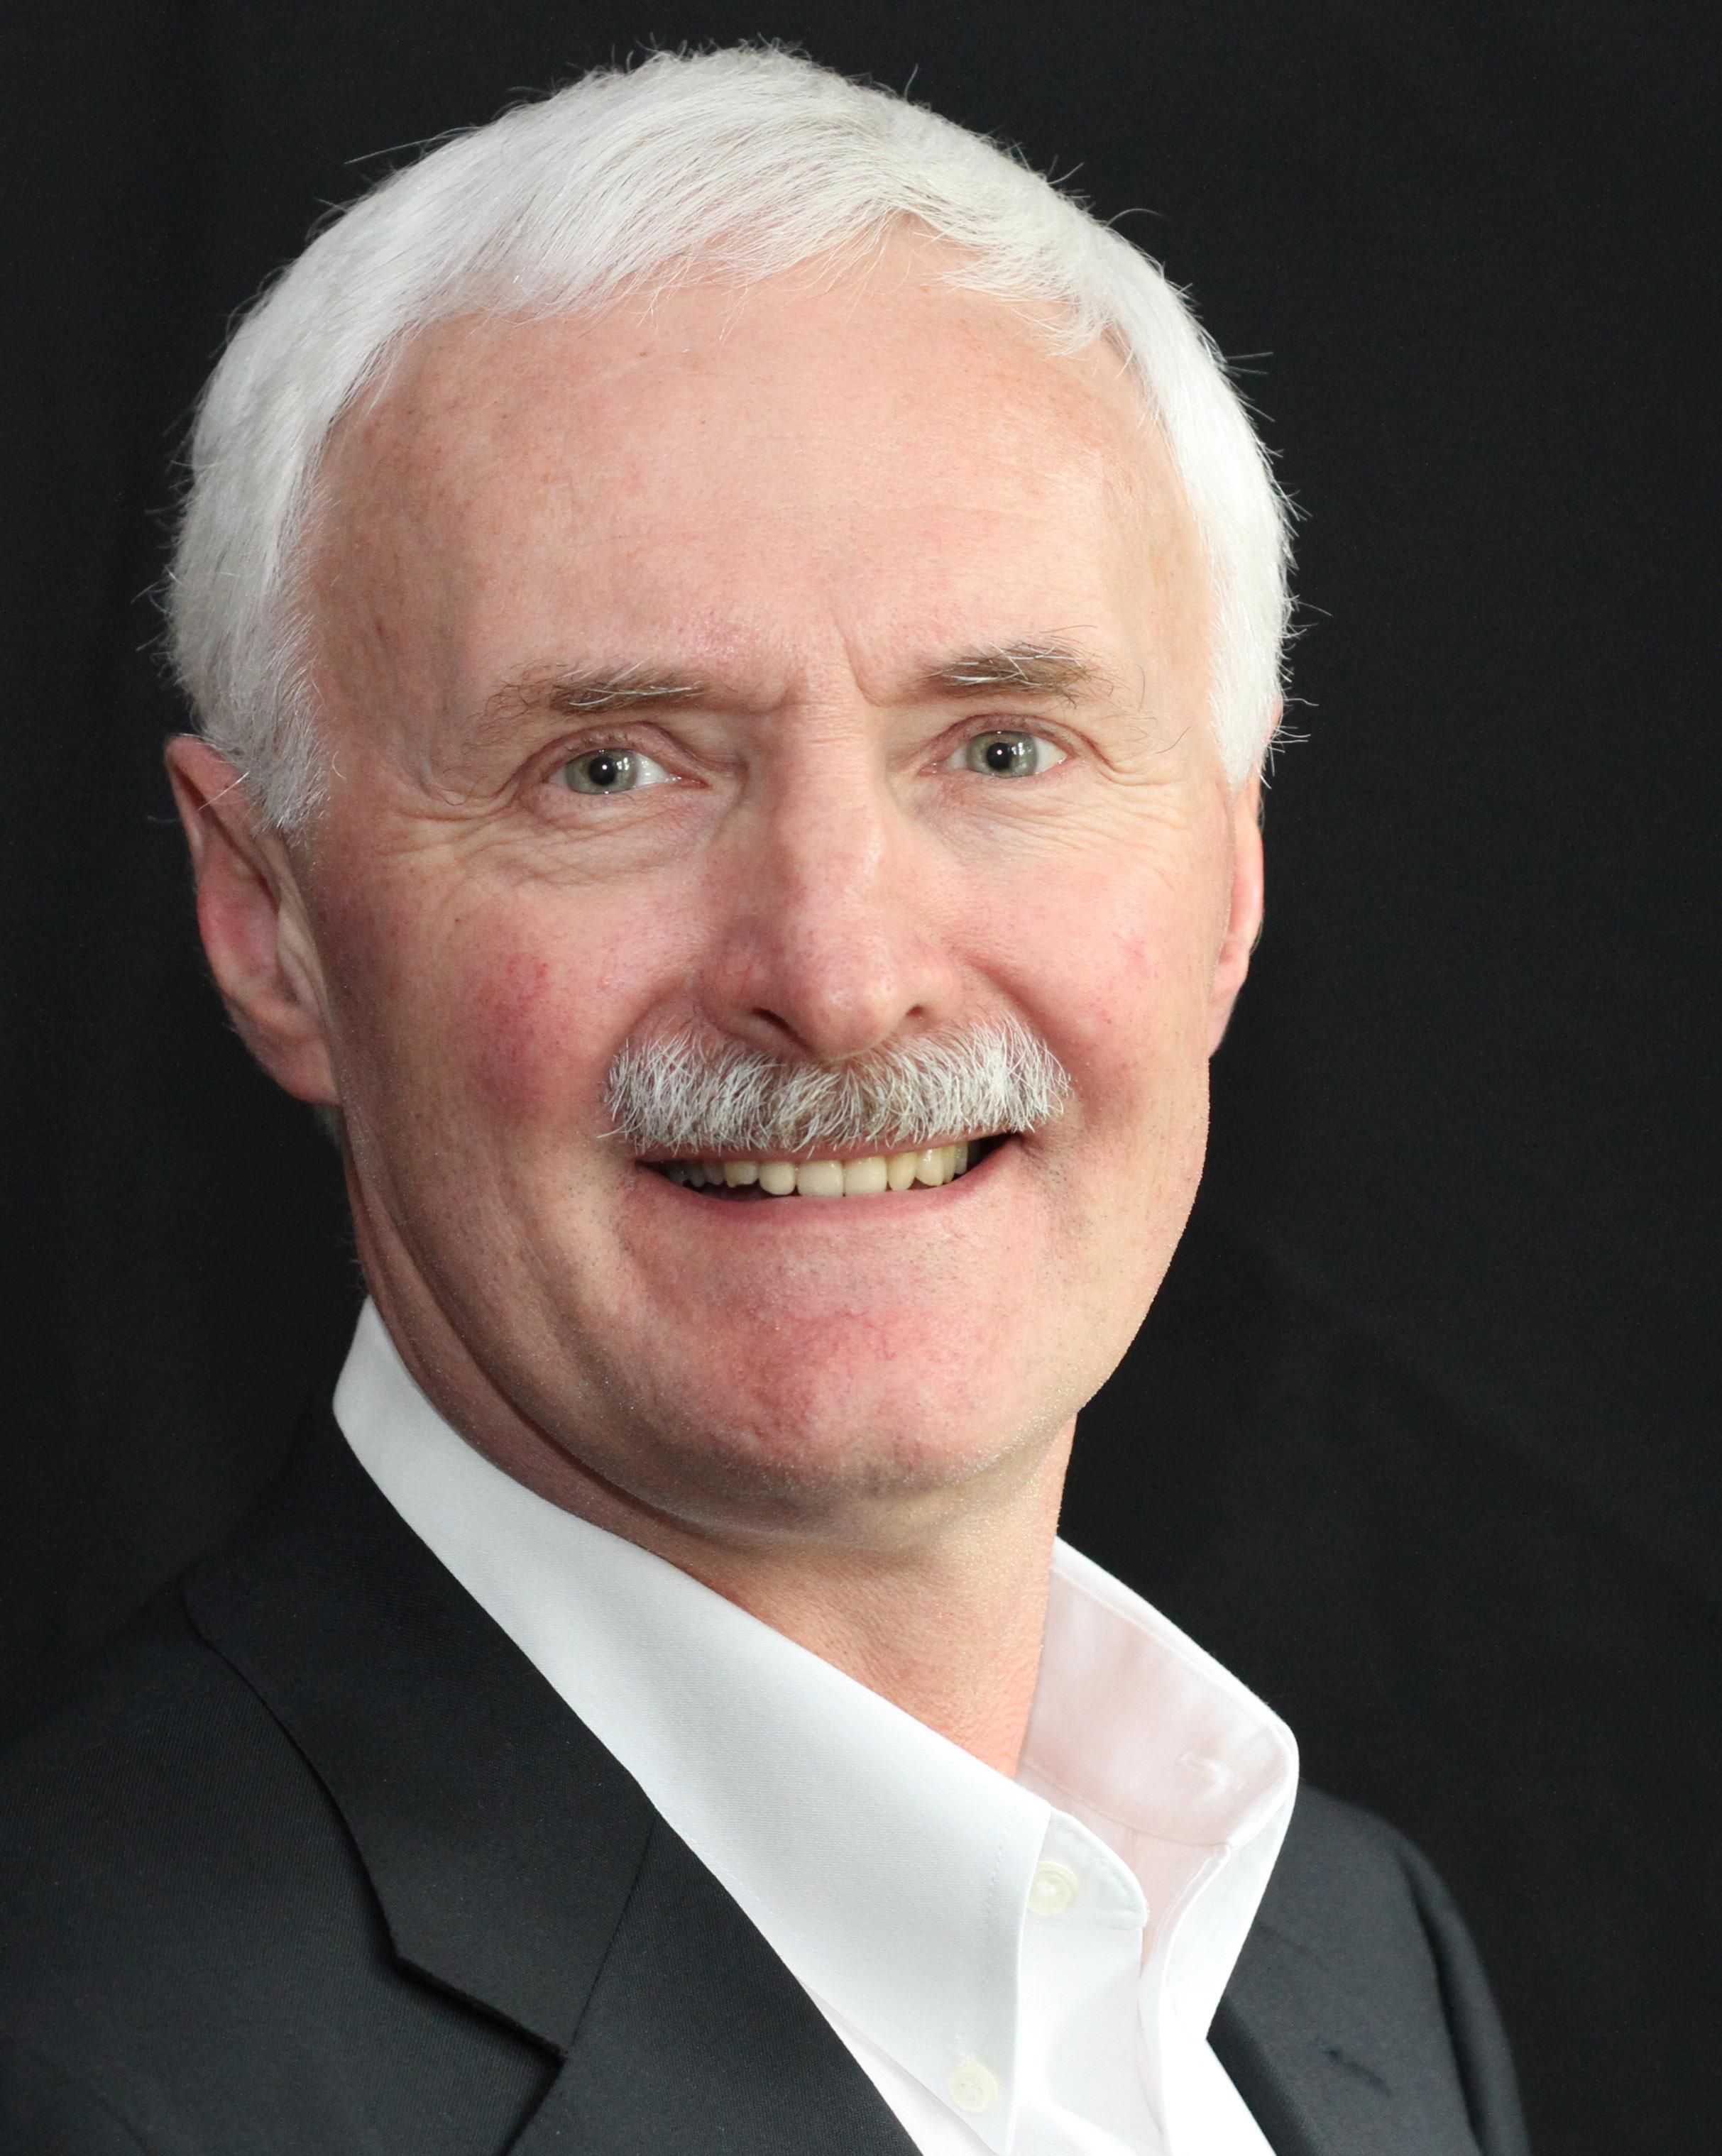 Dr. Roman Jovey